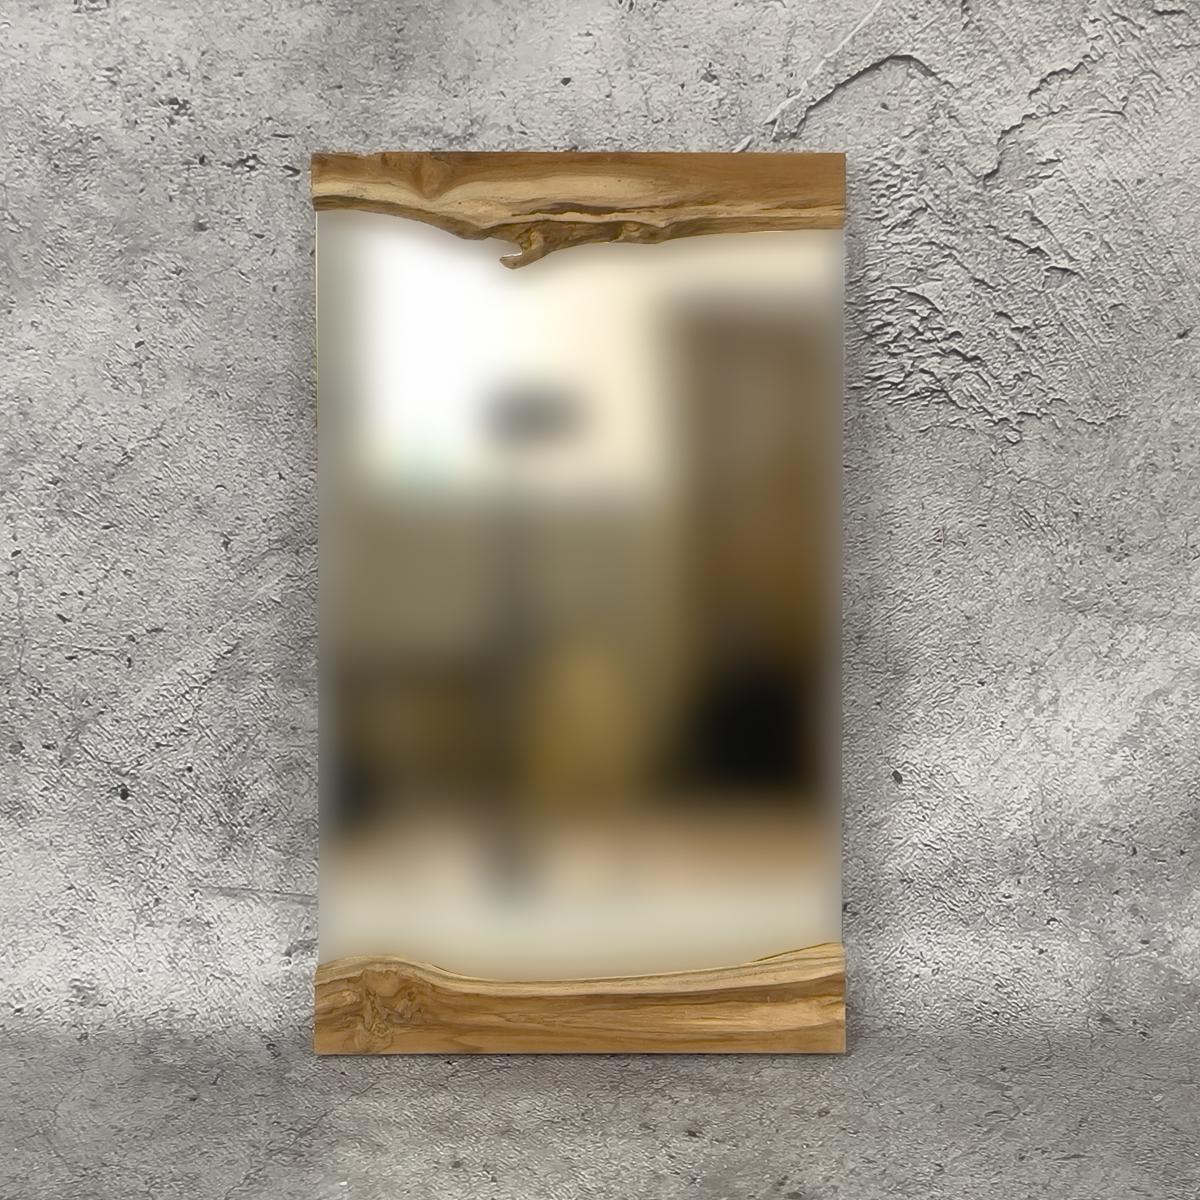 Espejo decorativo de madera de Tecaa de madera de Teca de 60x40